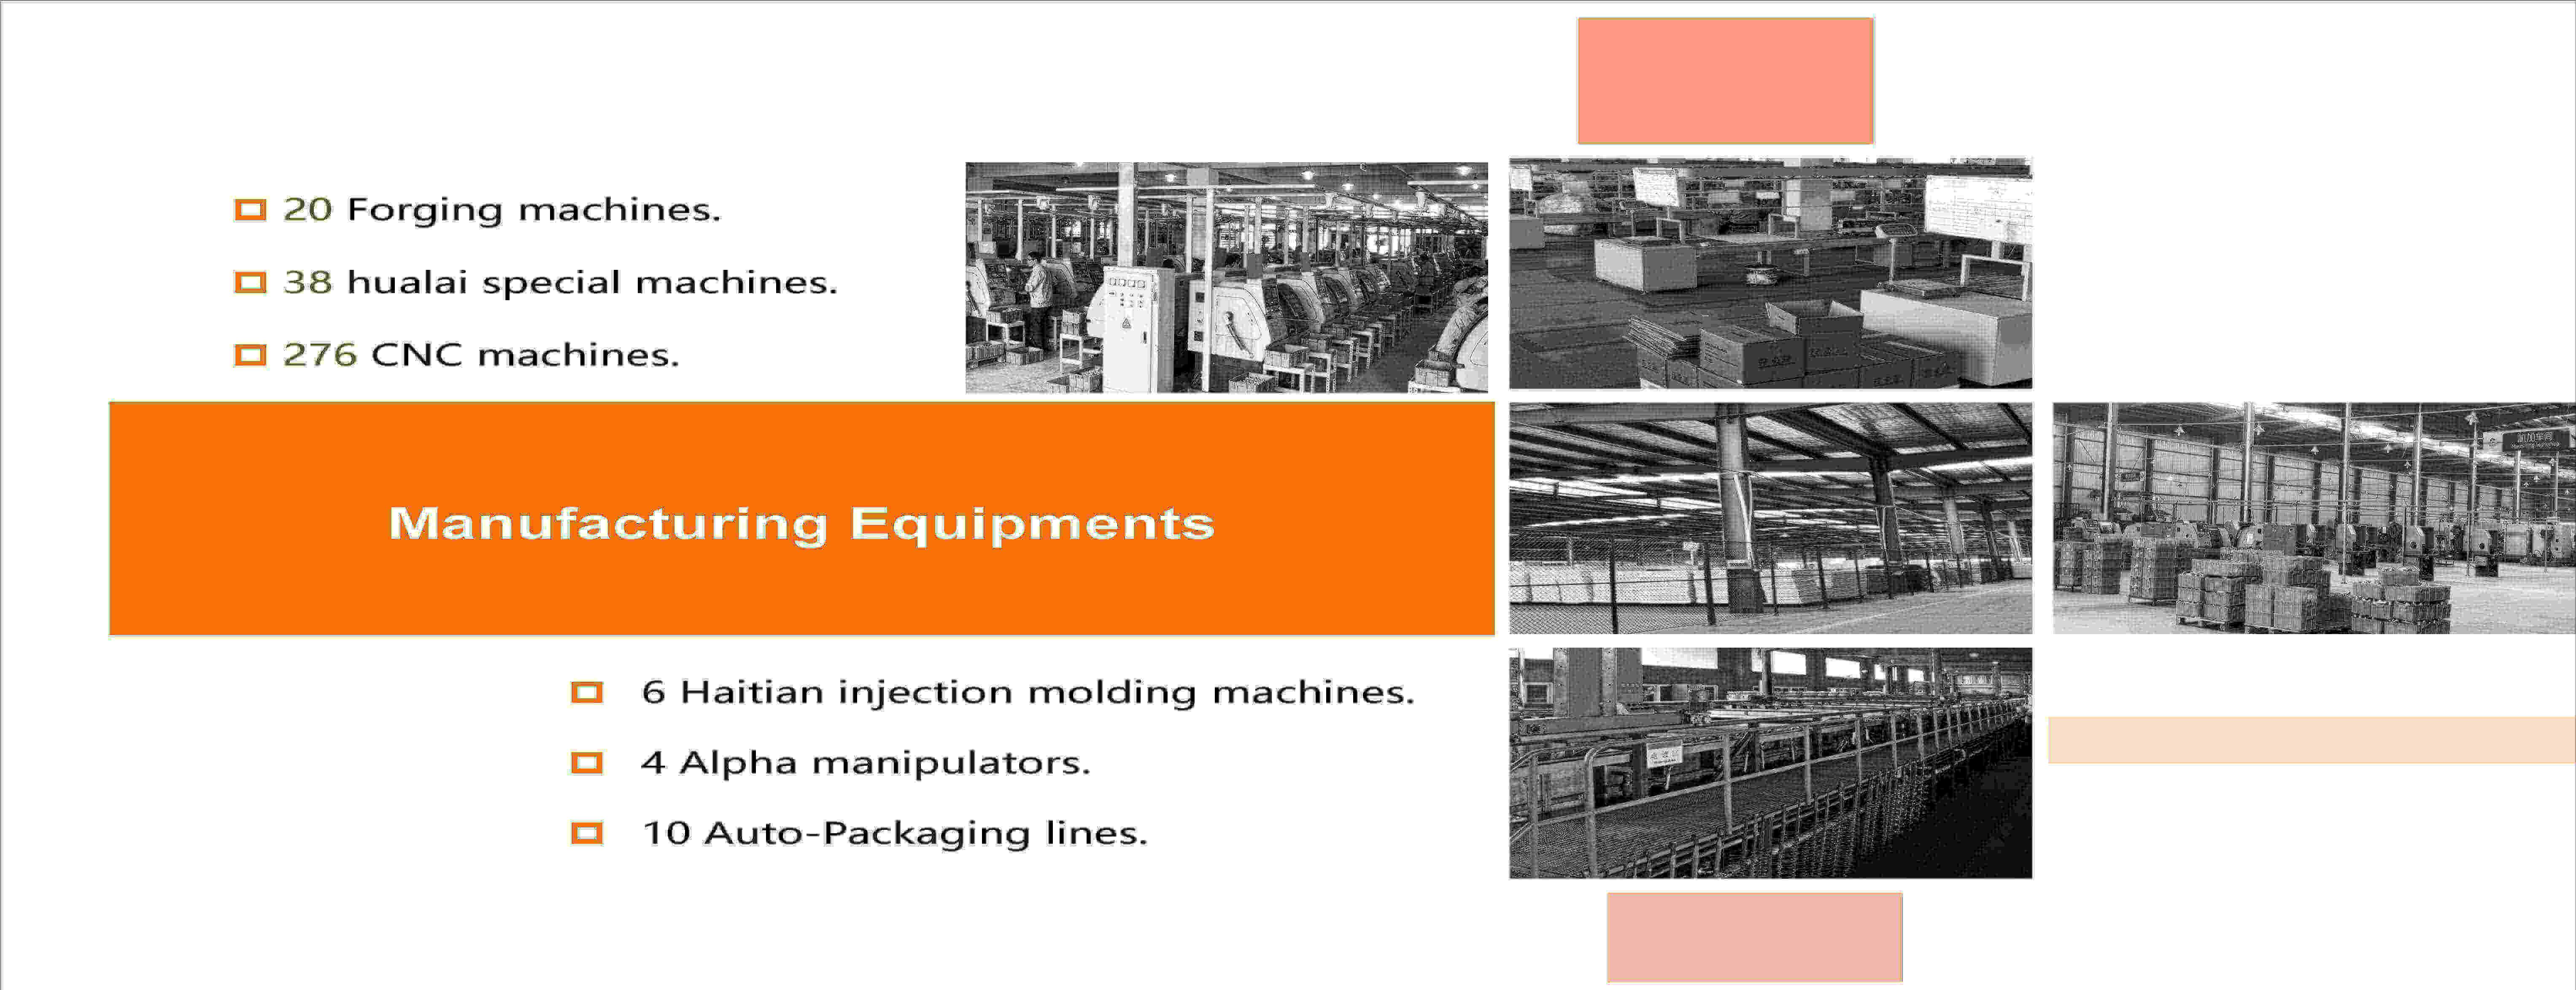 towel radiator manufacturers production